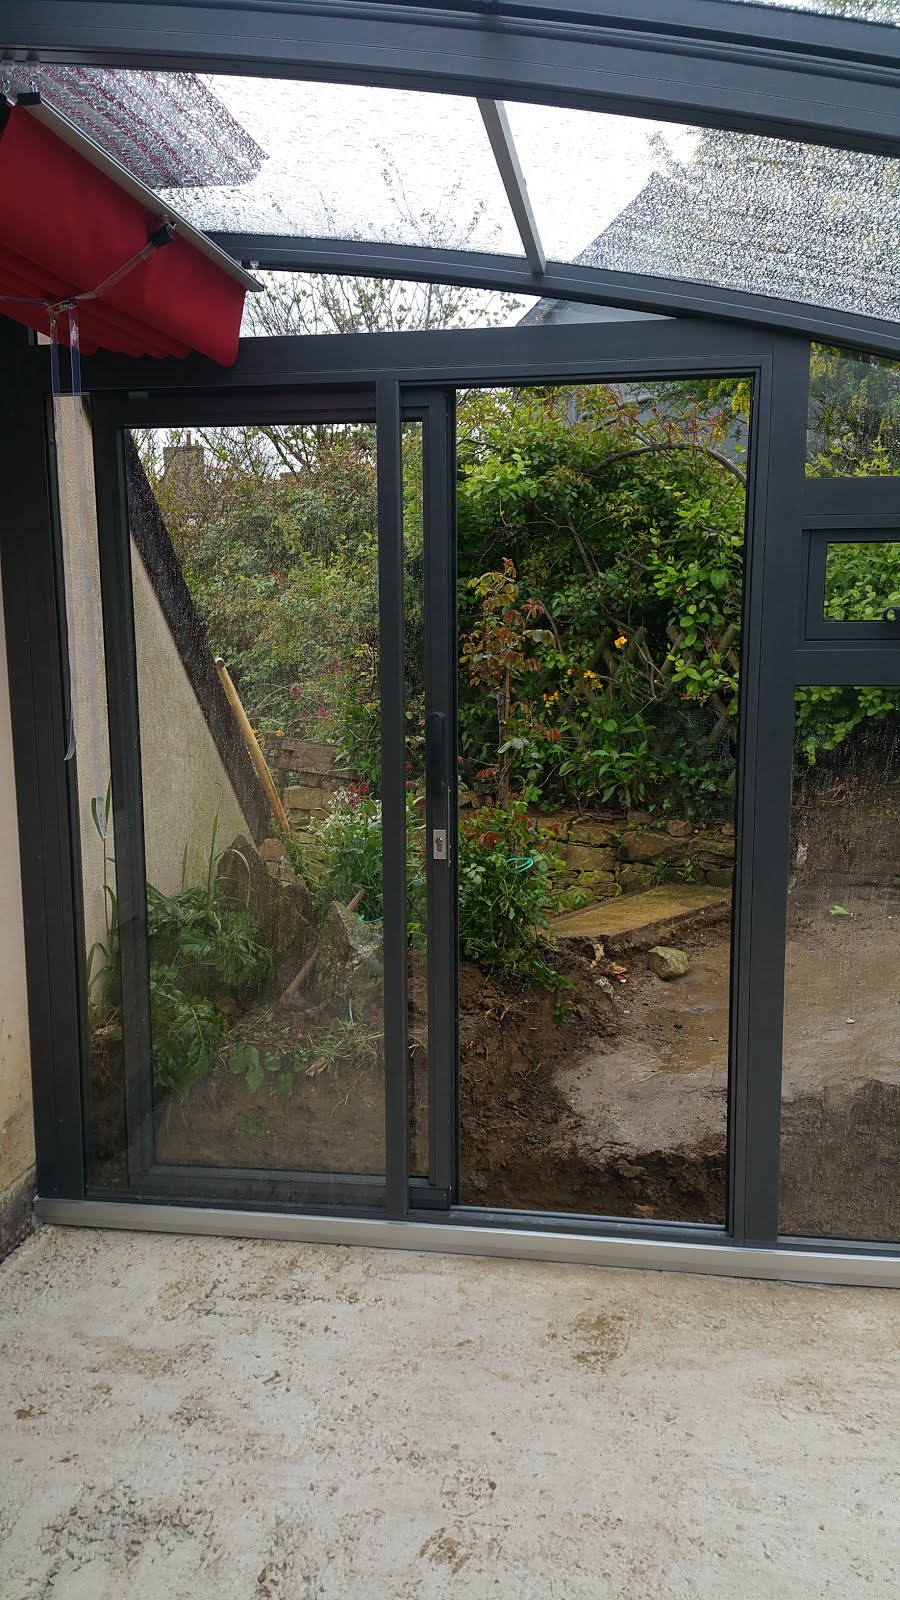 abri de terrasse : abri terrasse et veranda en Cotes d Armor